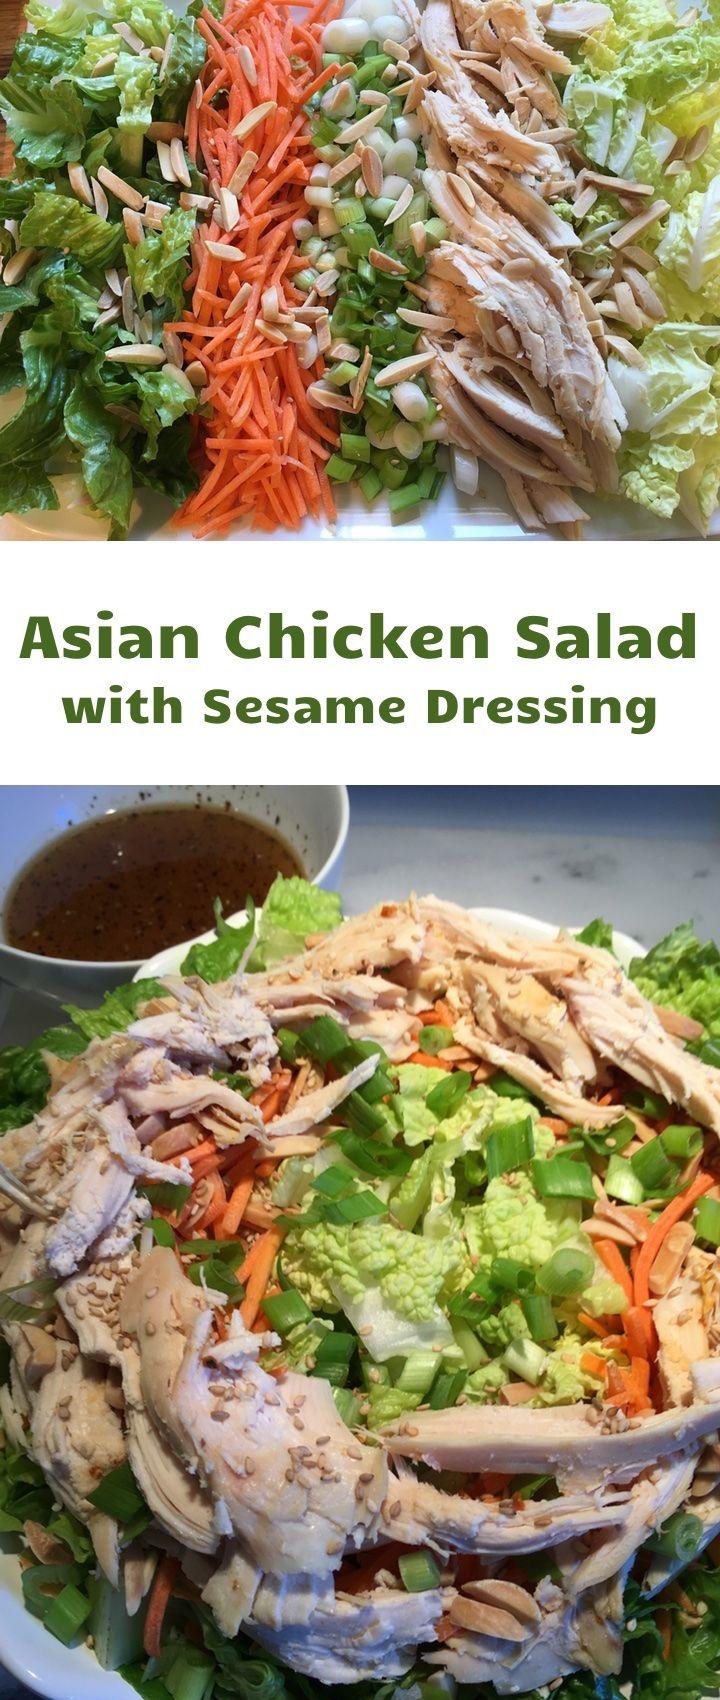 Asian Chicken Salad with Sesame Dressing - @JustSavorIt